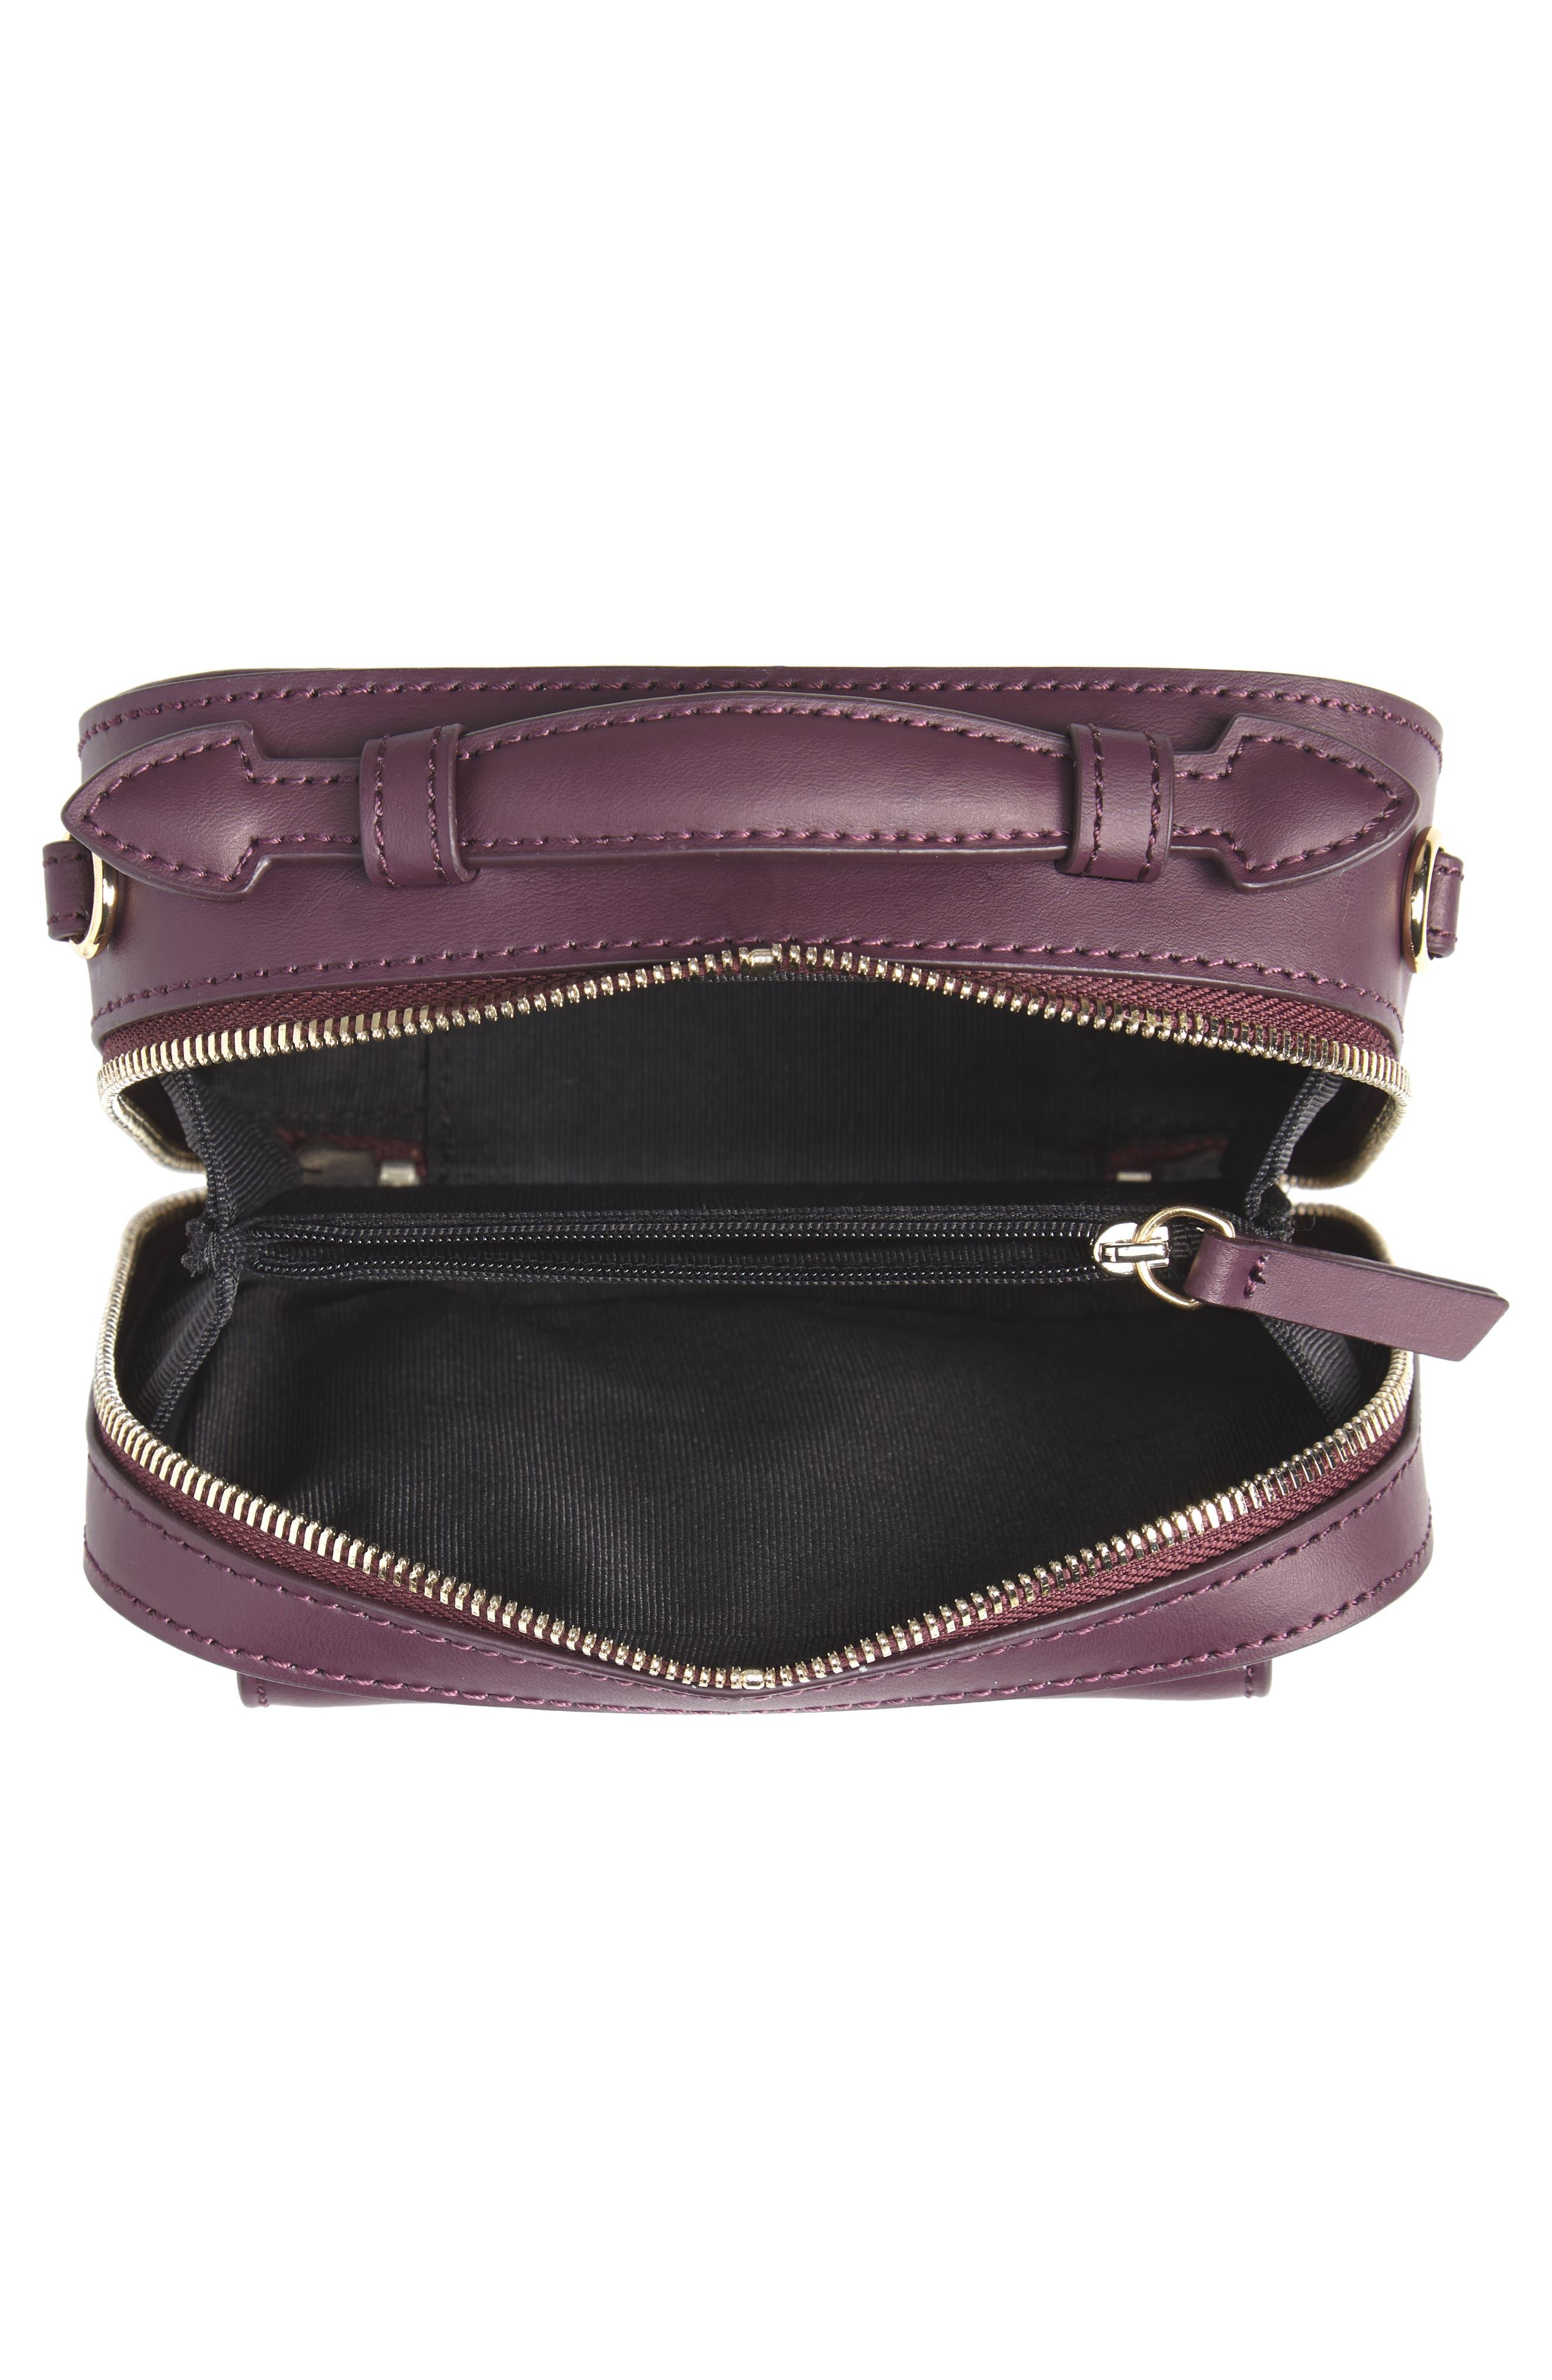 ZAC ZAC POSEN, Earthette Small Box Leather Crossbody Bag, Alternate thumbnail 4, color, 501